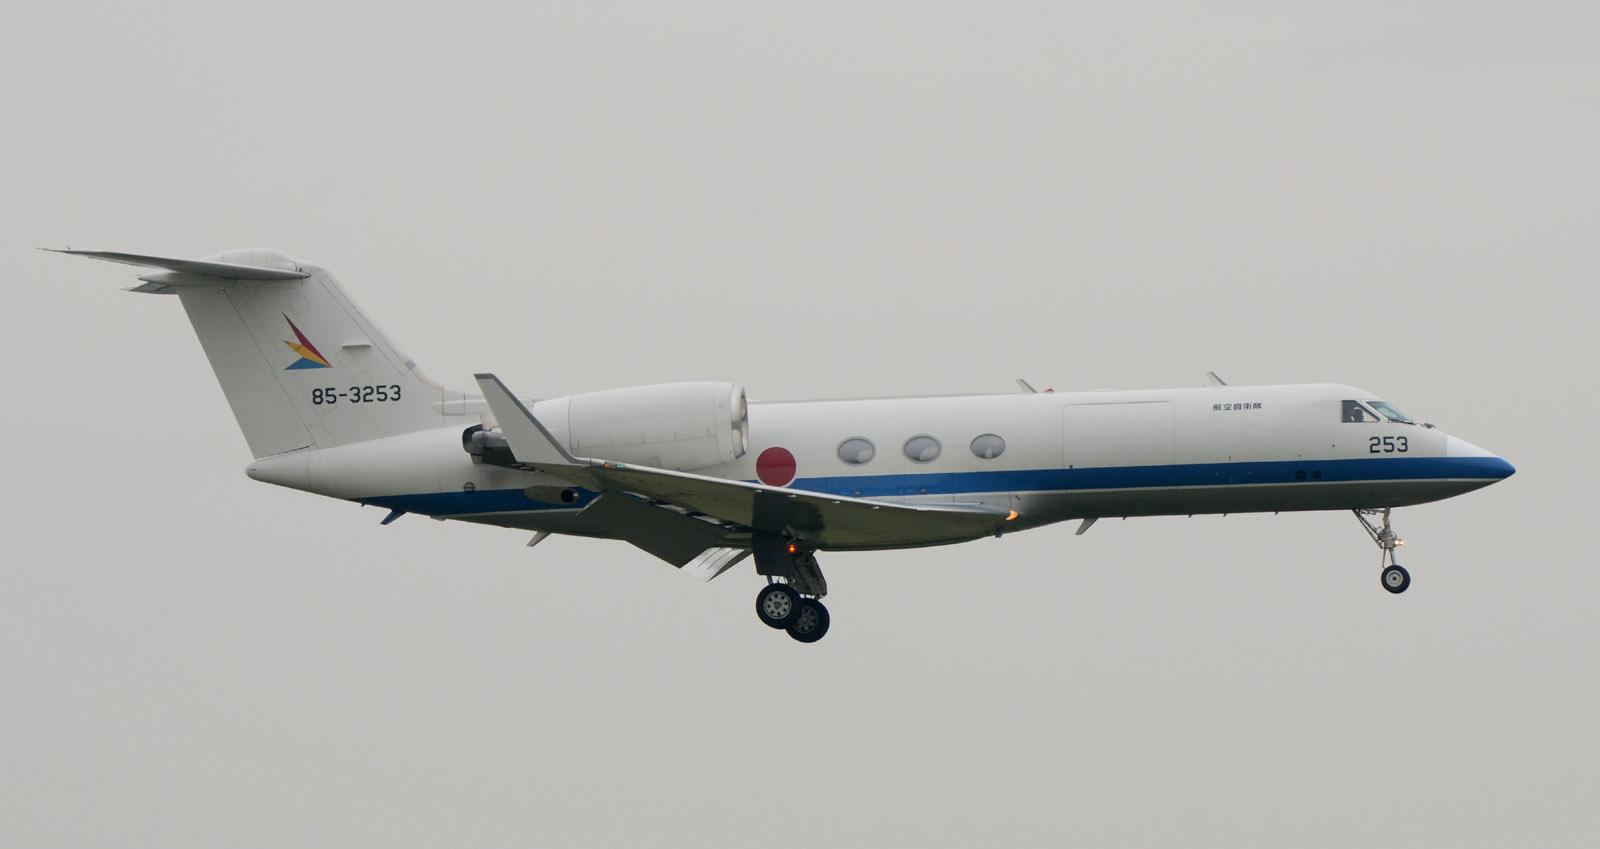 U4150519g558